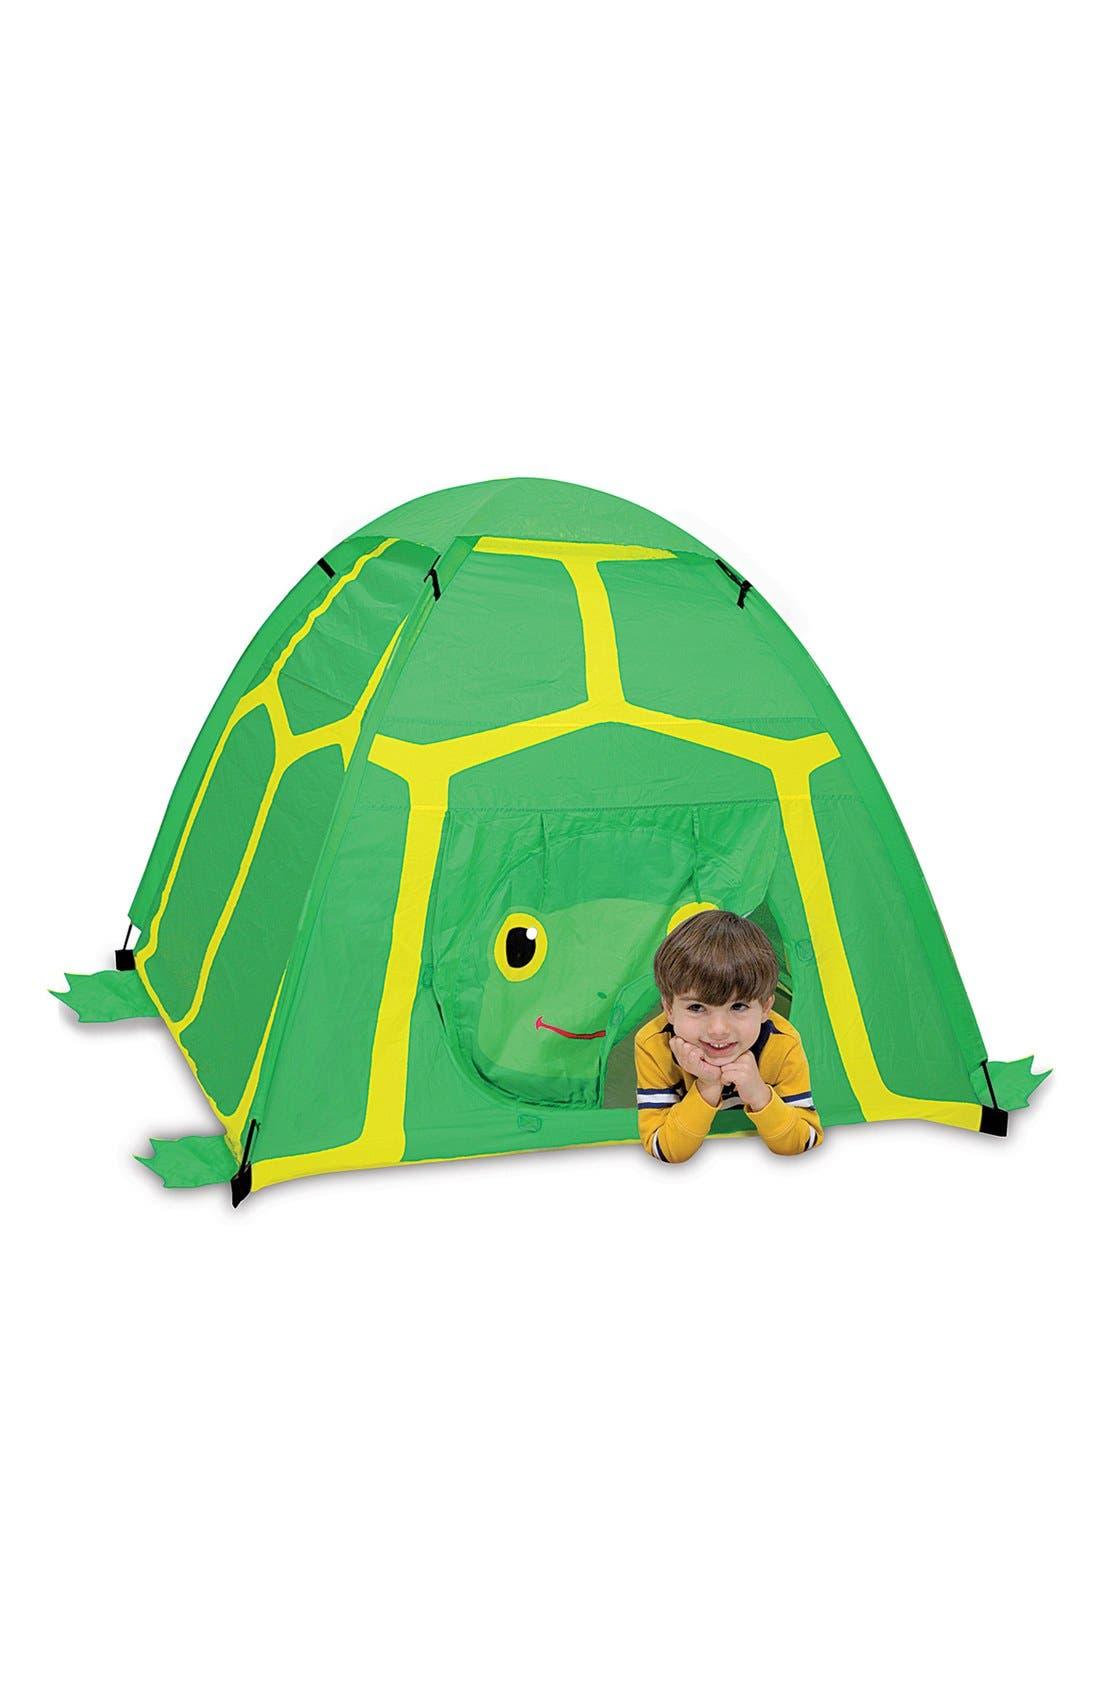 Main Image - Melissa u0026 Doug u0027Tootle Turtleu0027 Tent  sc 1 st  Nordstrom & Melissa u0026 Doug u0027Tootle Turtleu0027 Tent   Nordstrom